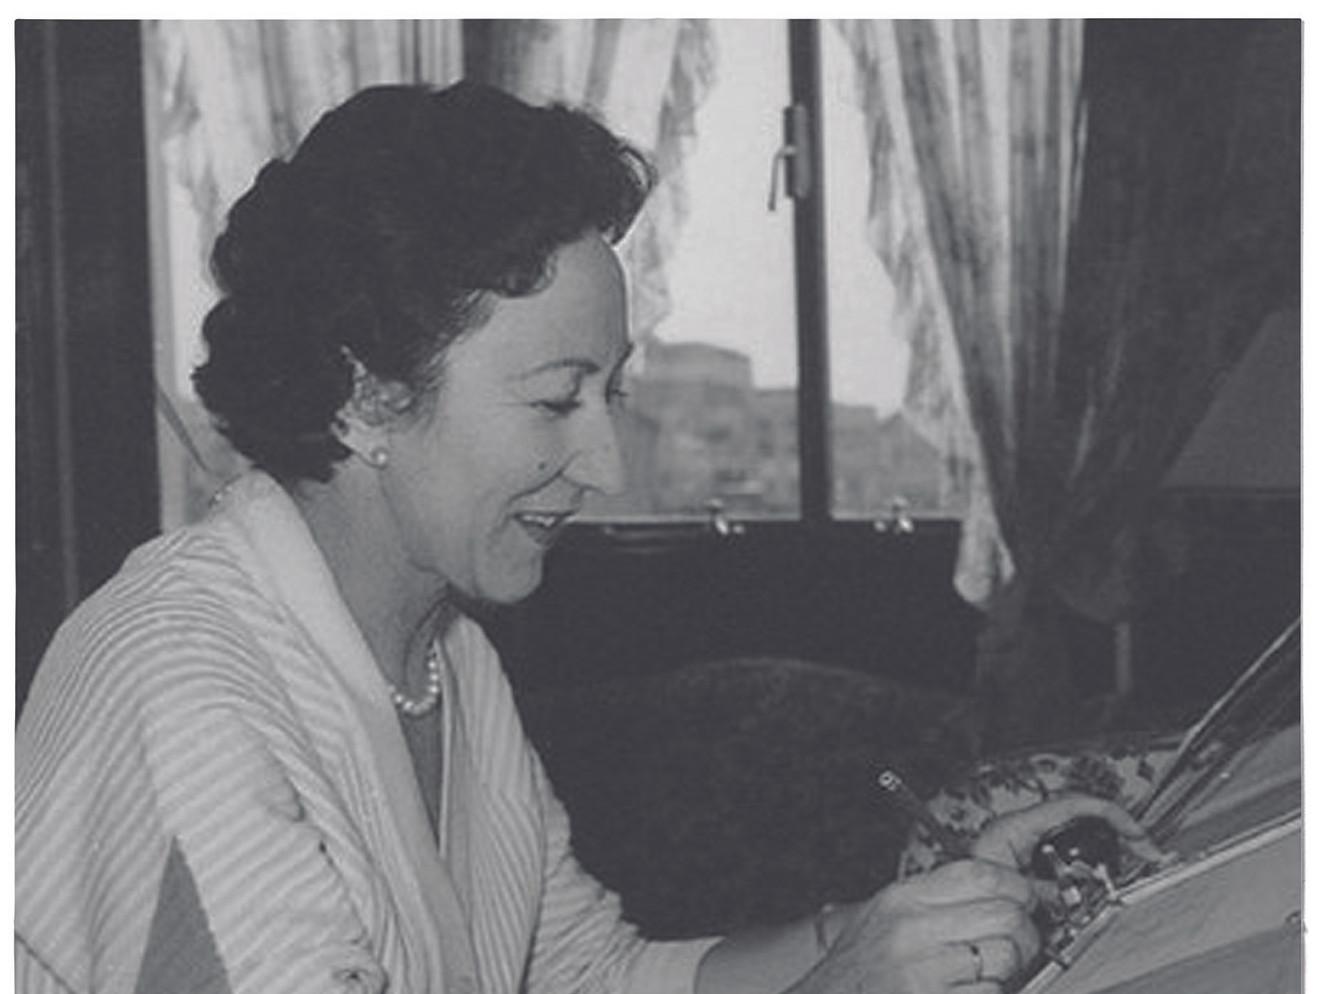 ¿Quién fue Matilde Ucelay?